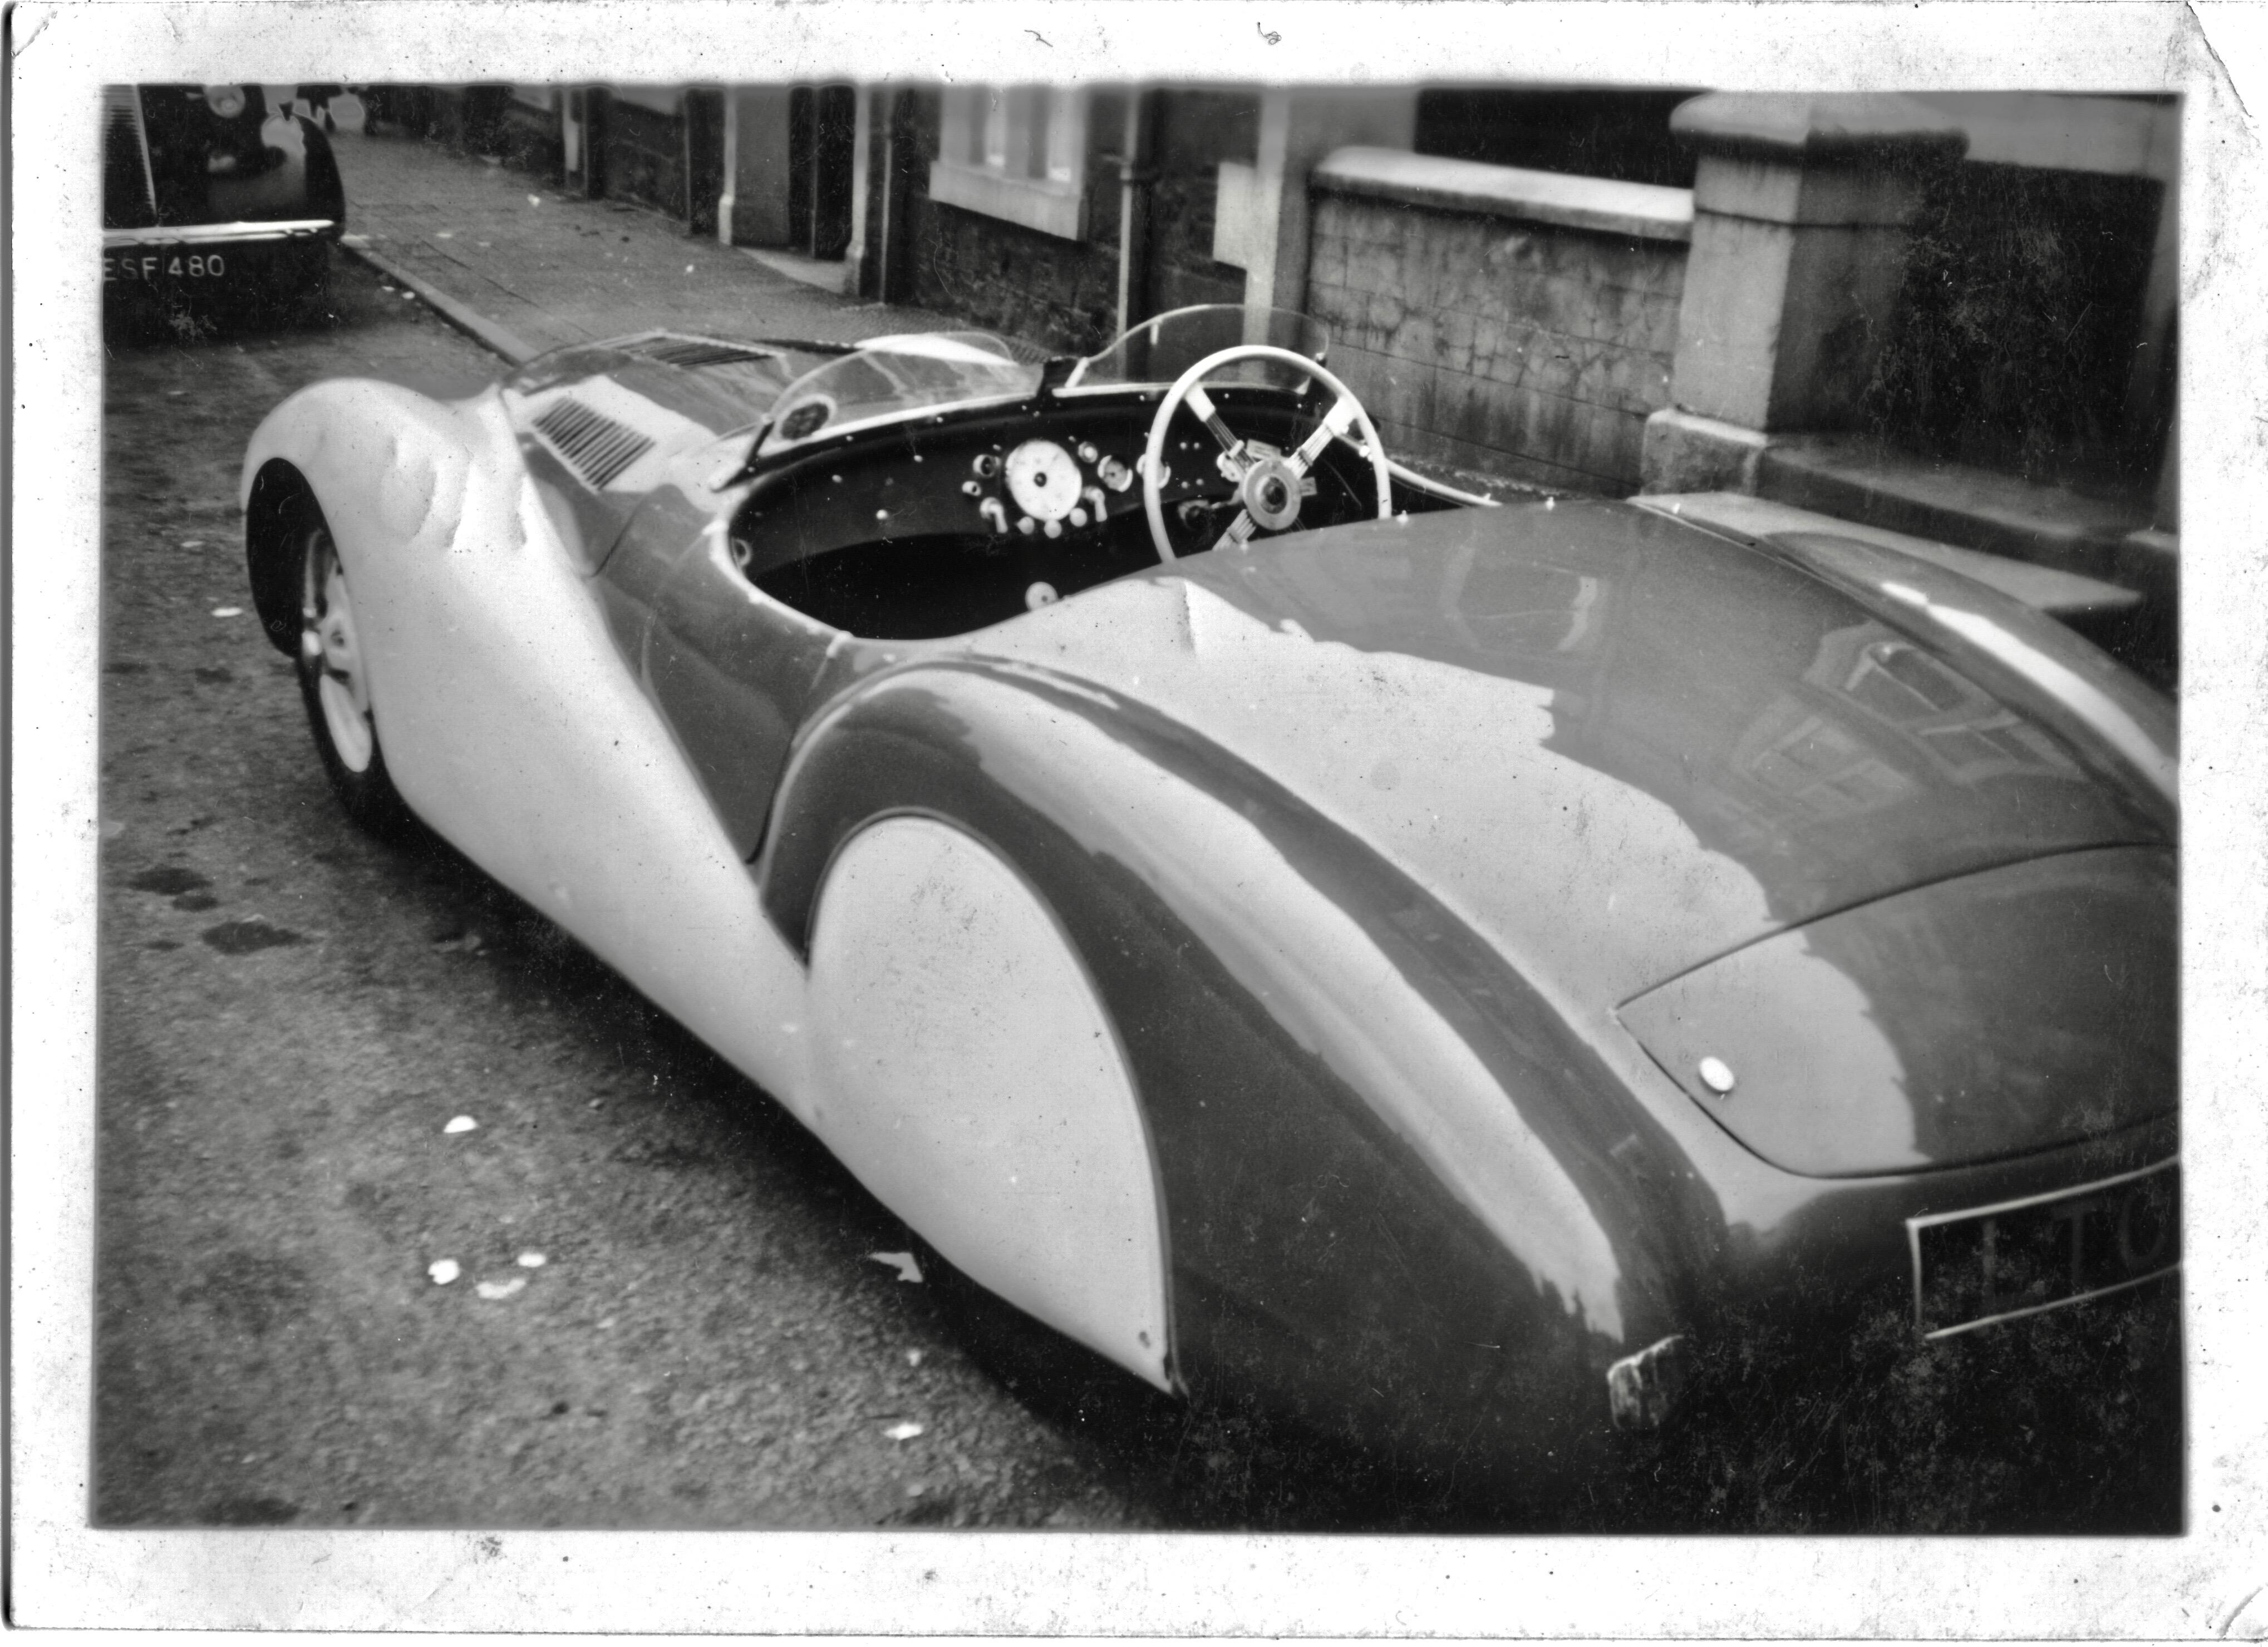 LTC 9 .BMW Mille Miglia. believed Liverpool 1940s. Gillie Tyrer. REAR PHOTO 2